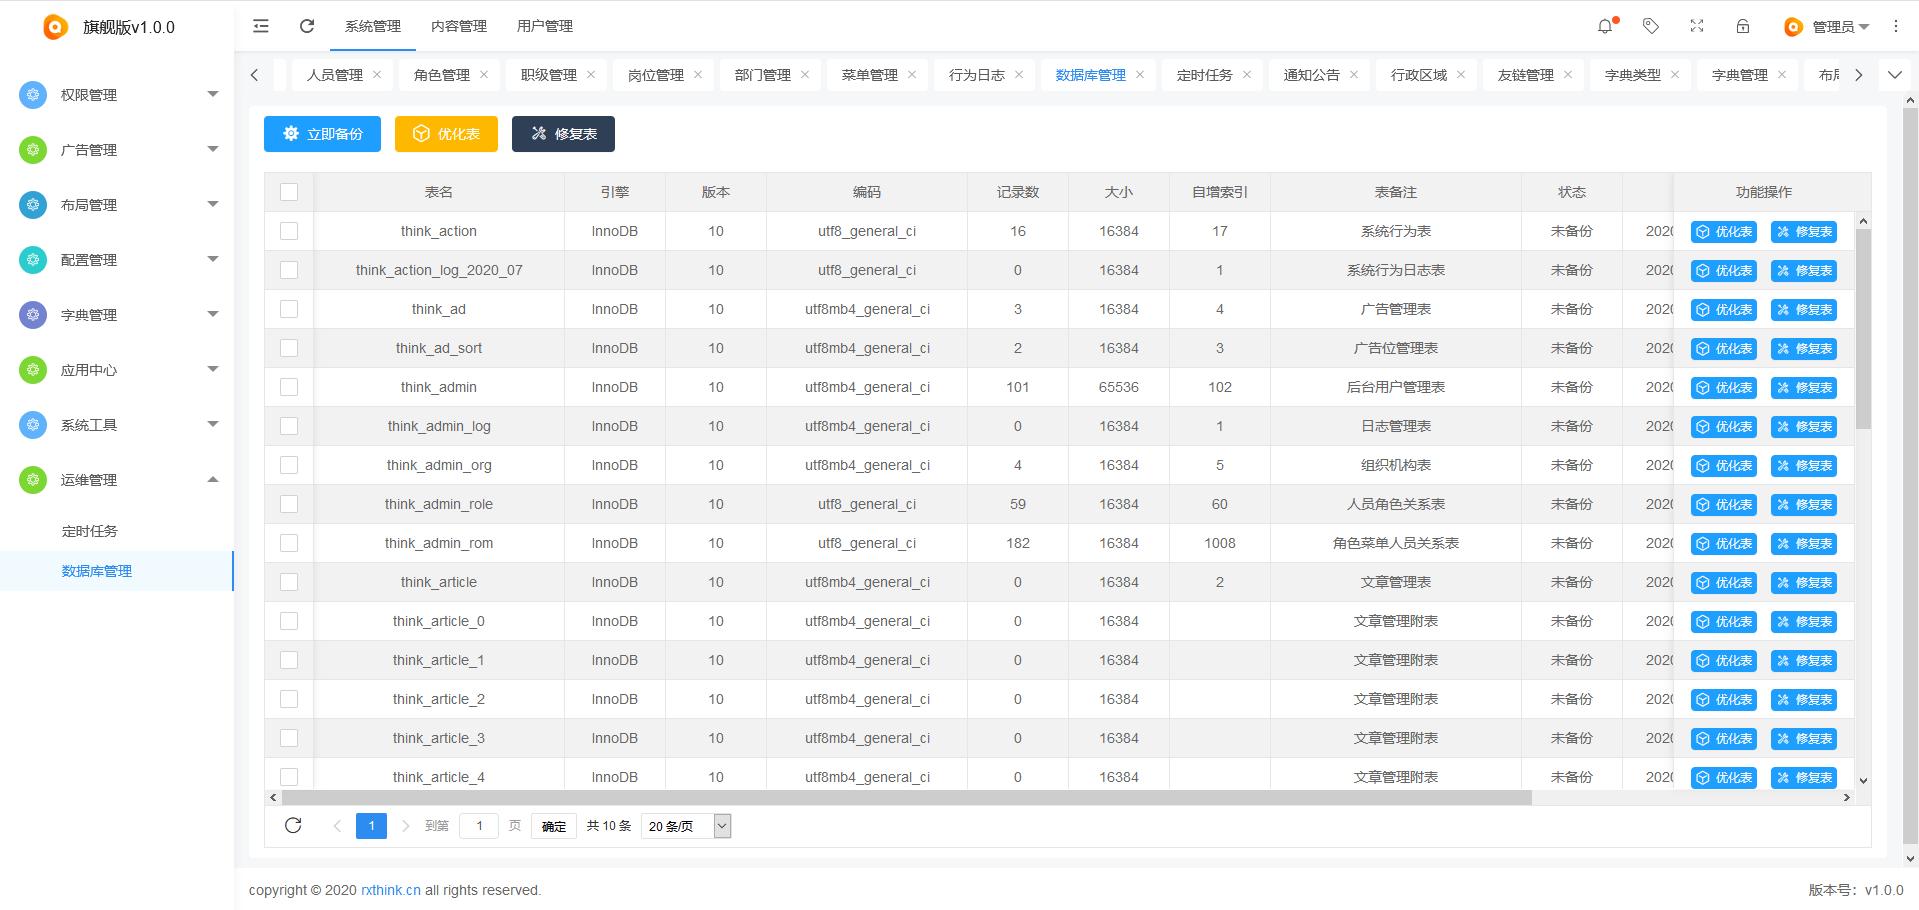 RXThinkCMF_TP6 v2.2.0 旗舰版发布,优化富文本编辑器上传本地图片的功能